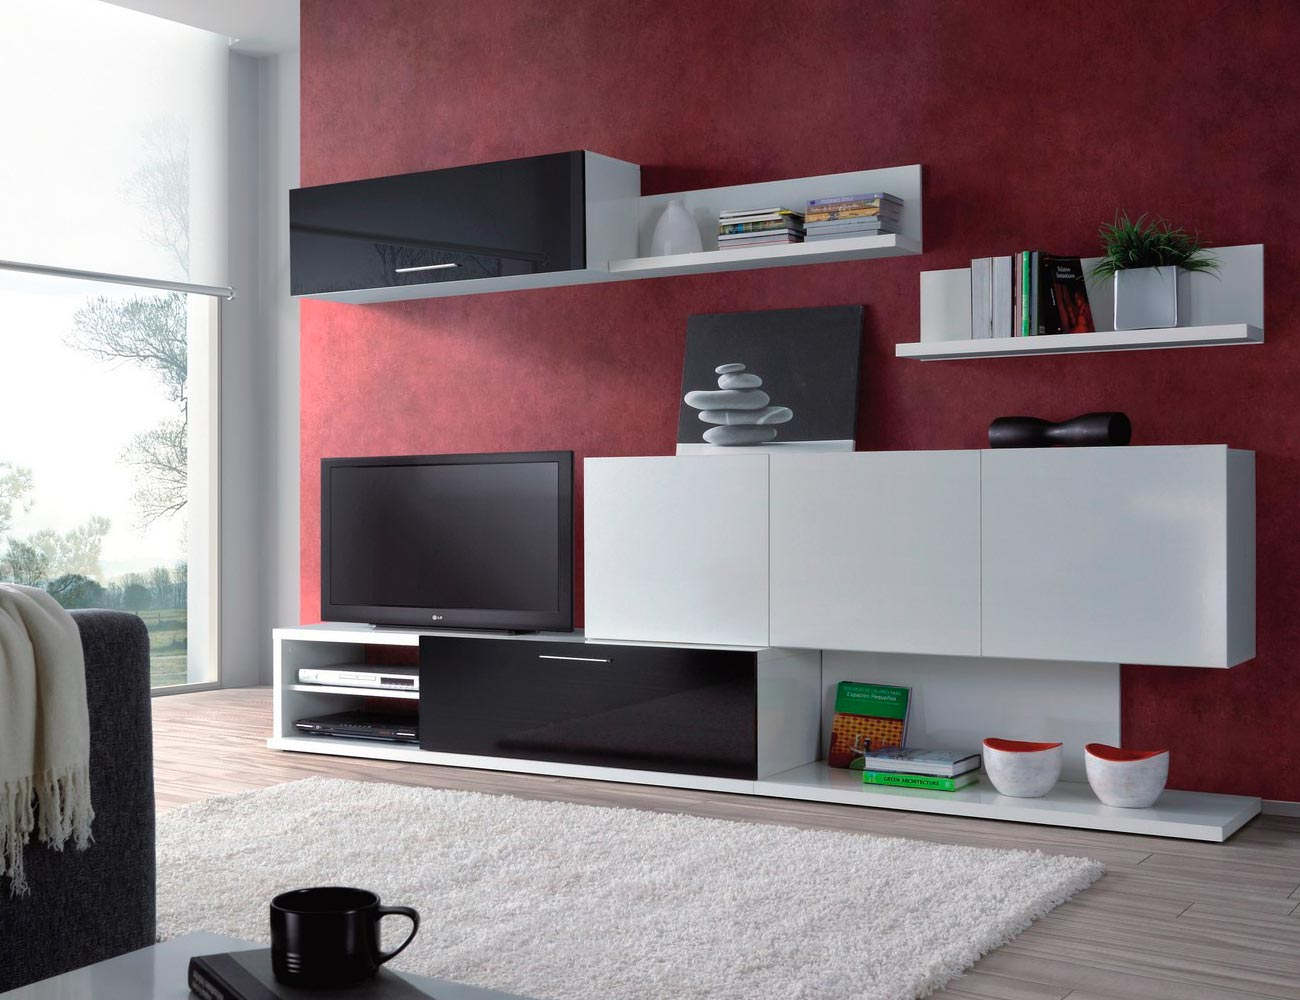 Mueble salon comodedor blanco negro